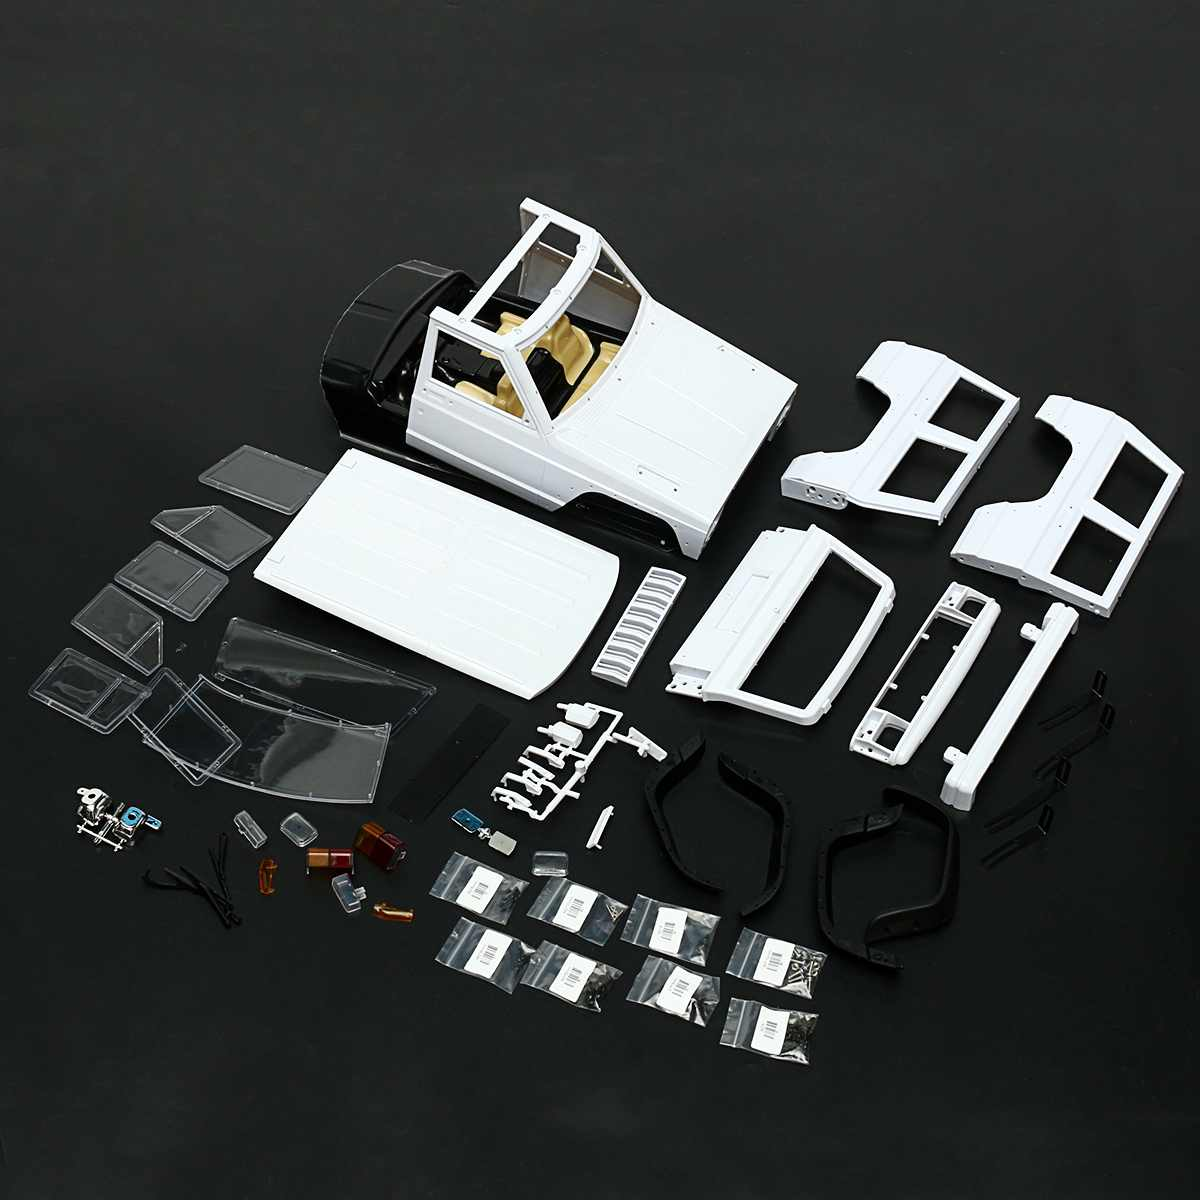 Hard Plastic Car Shell Body DIY Kit for 313mm Wheelbase 1/10 For Wrangler Jeeps Axial SCX10 RC Car Crawler Vehicle Model White